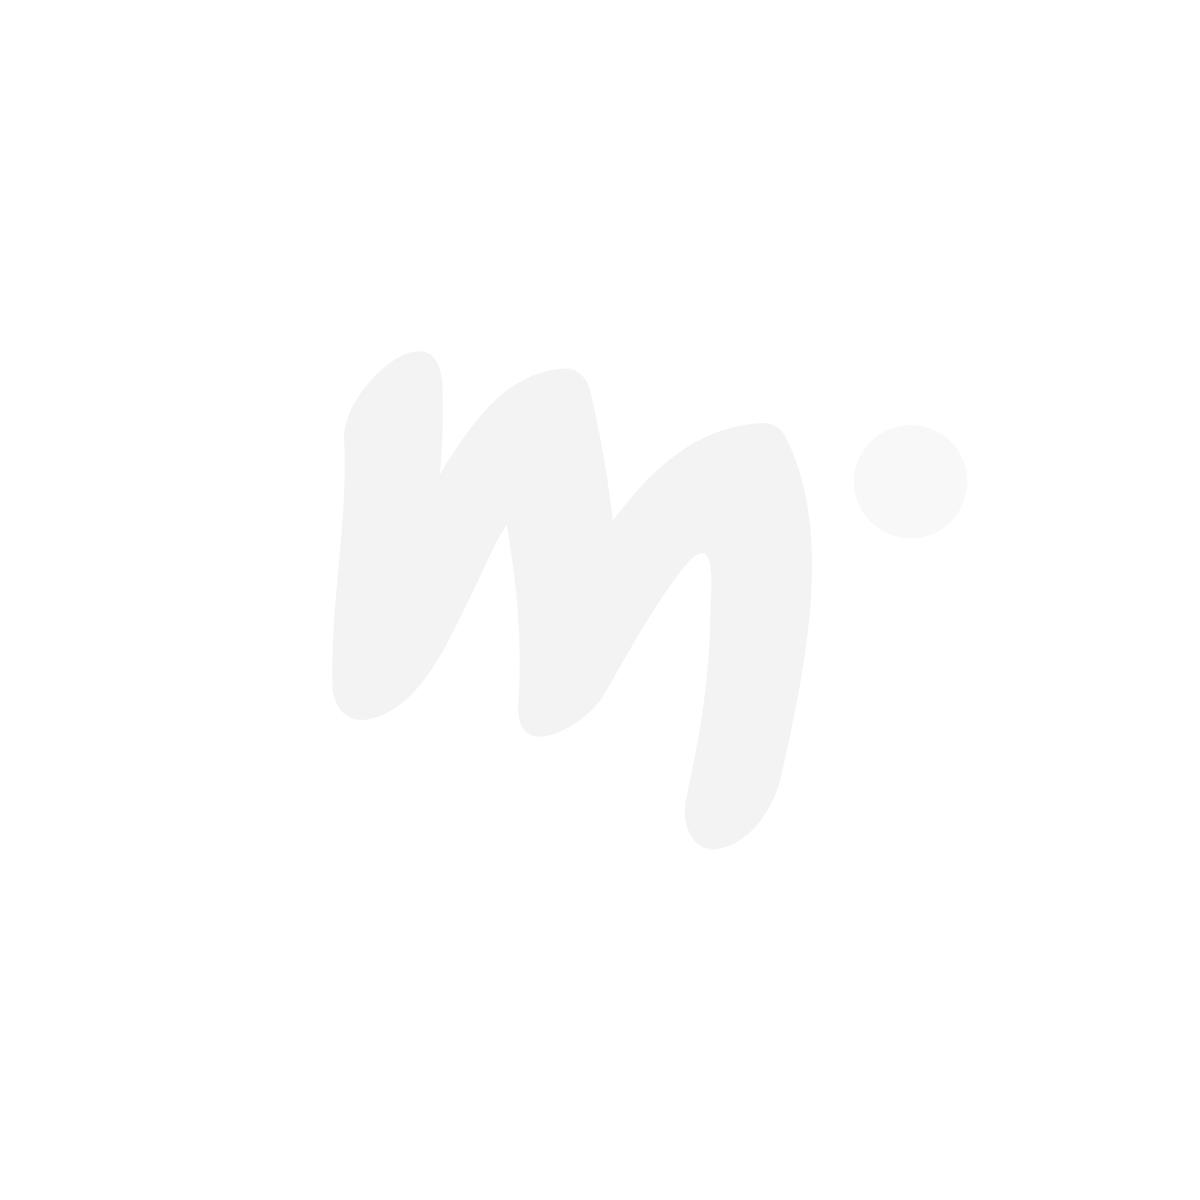 Maxx Batman Logo -chibipehmo